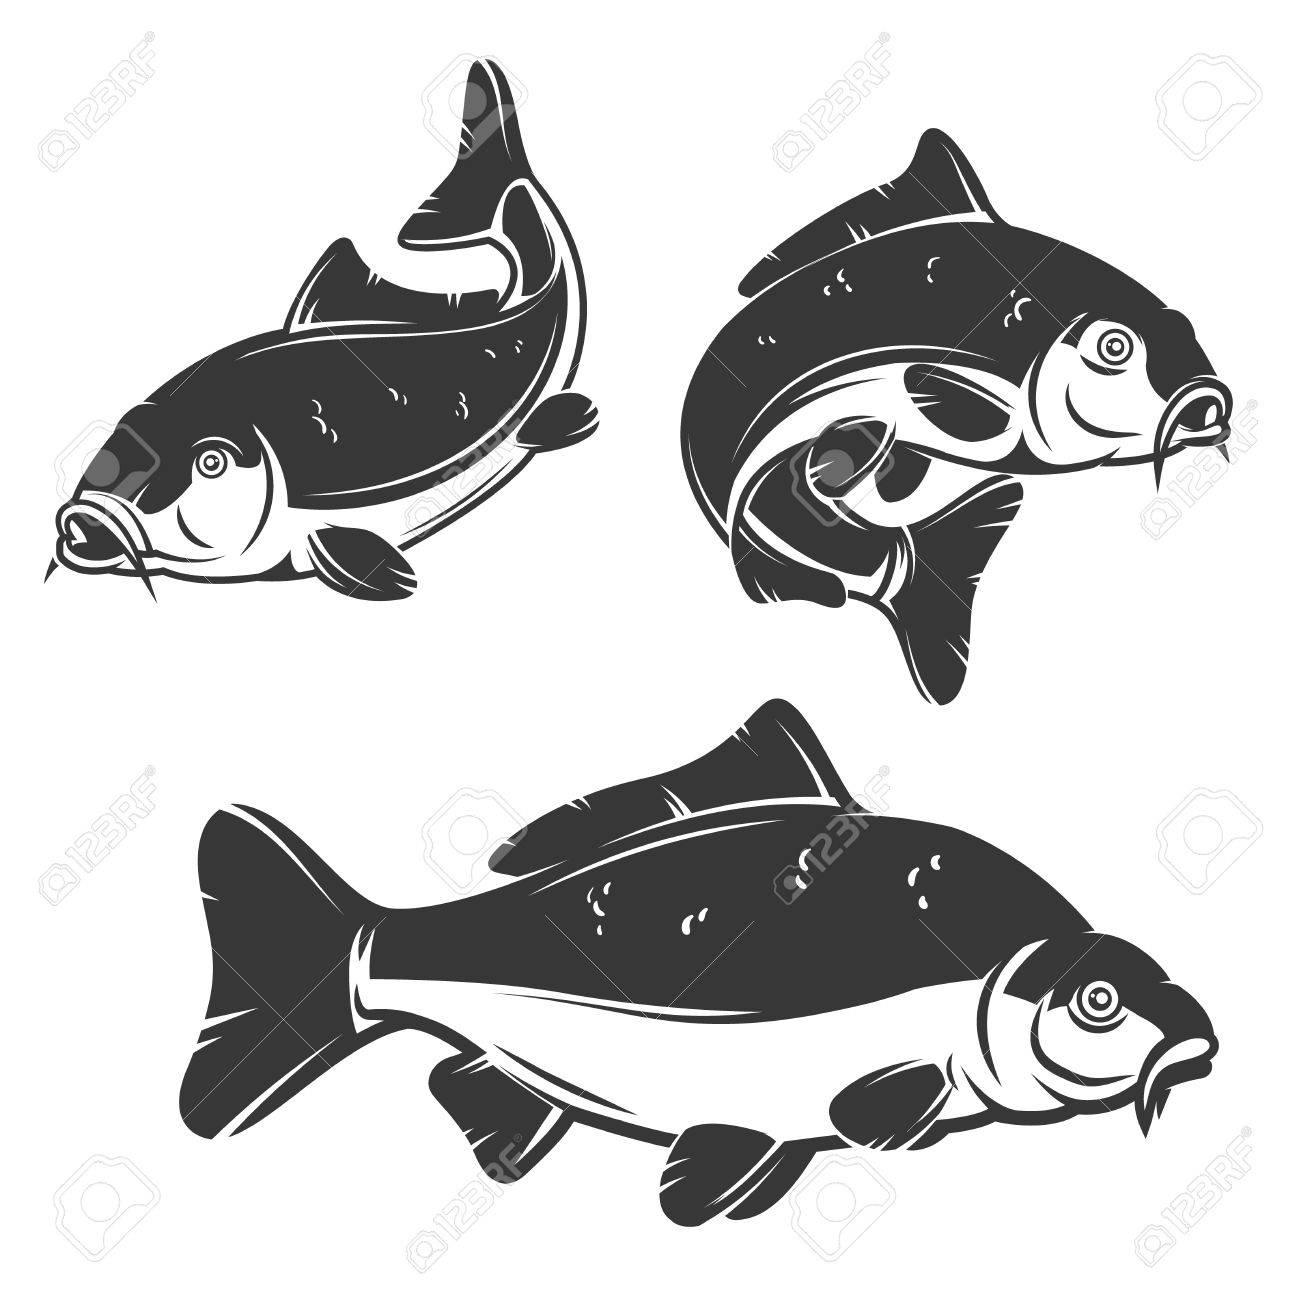 Set of carp fish icons isolated on white background. Design element, label, emblem, sign, brand mark. Vector illustration. - 72589927